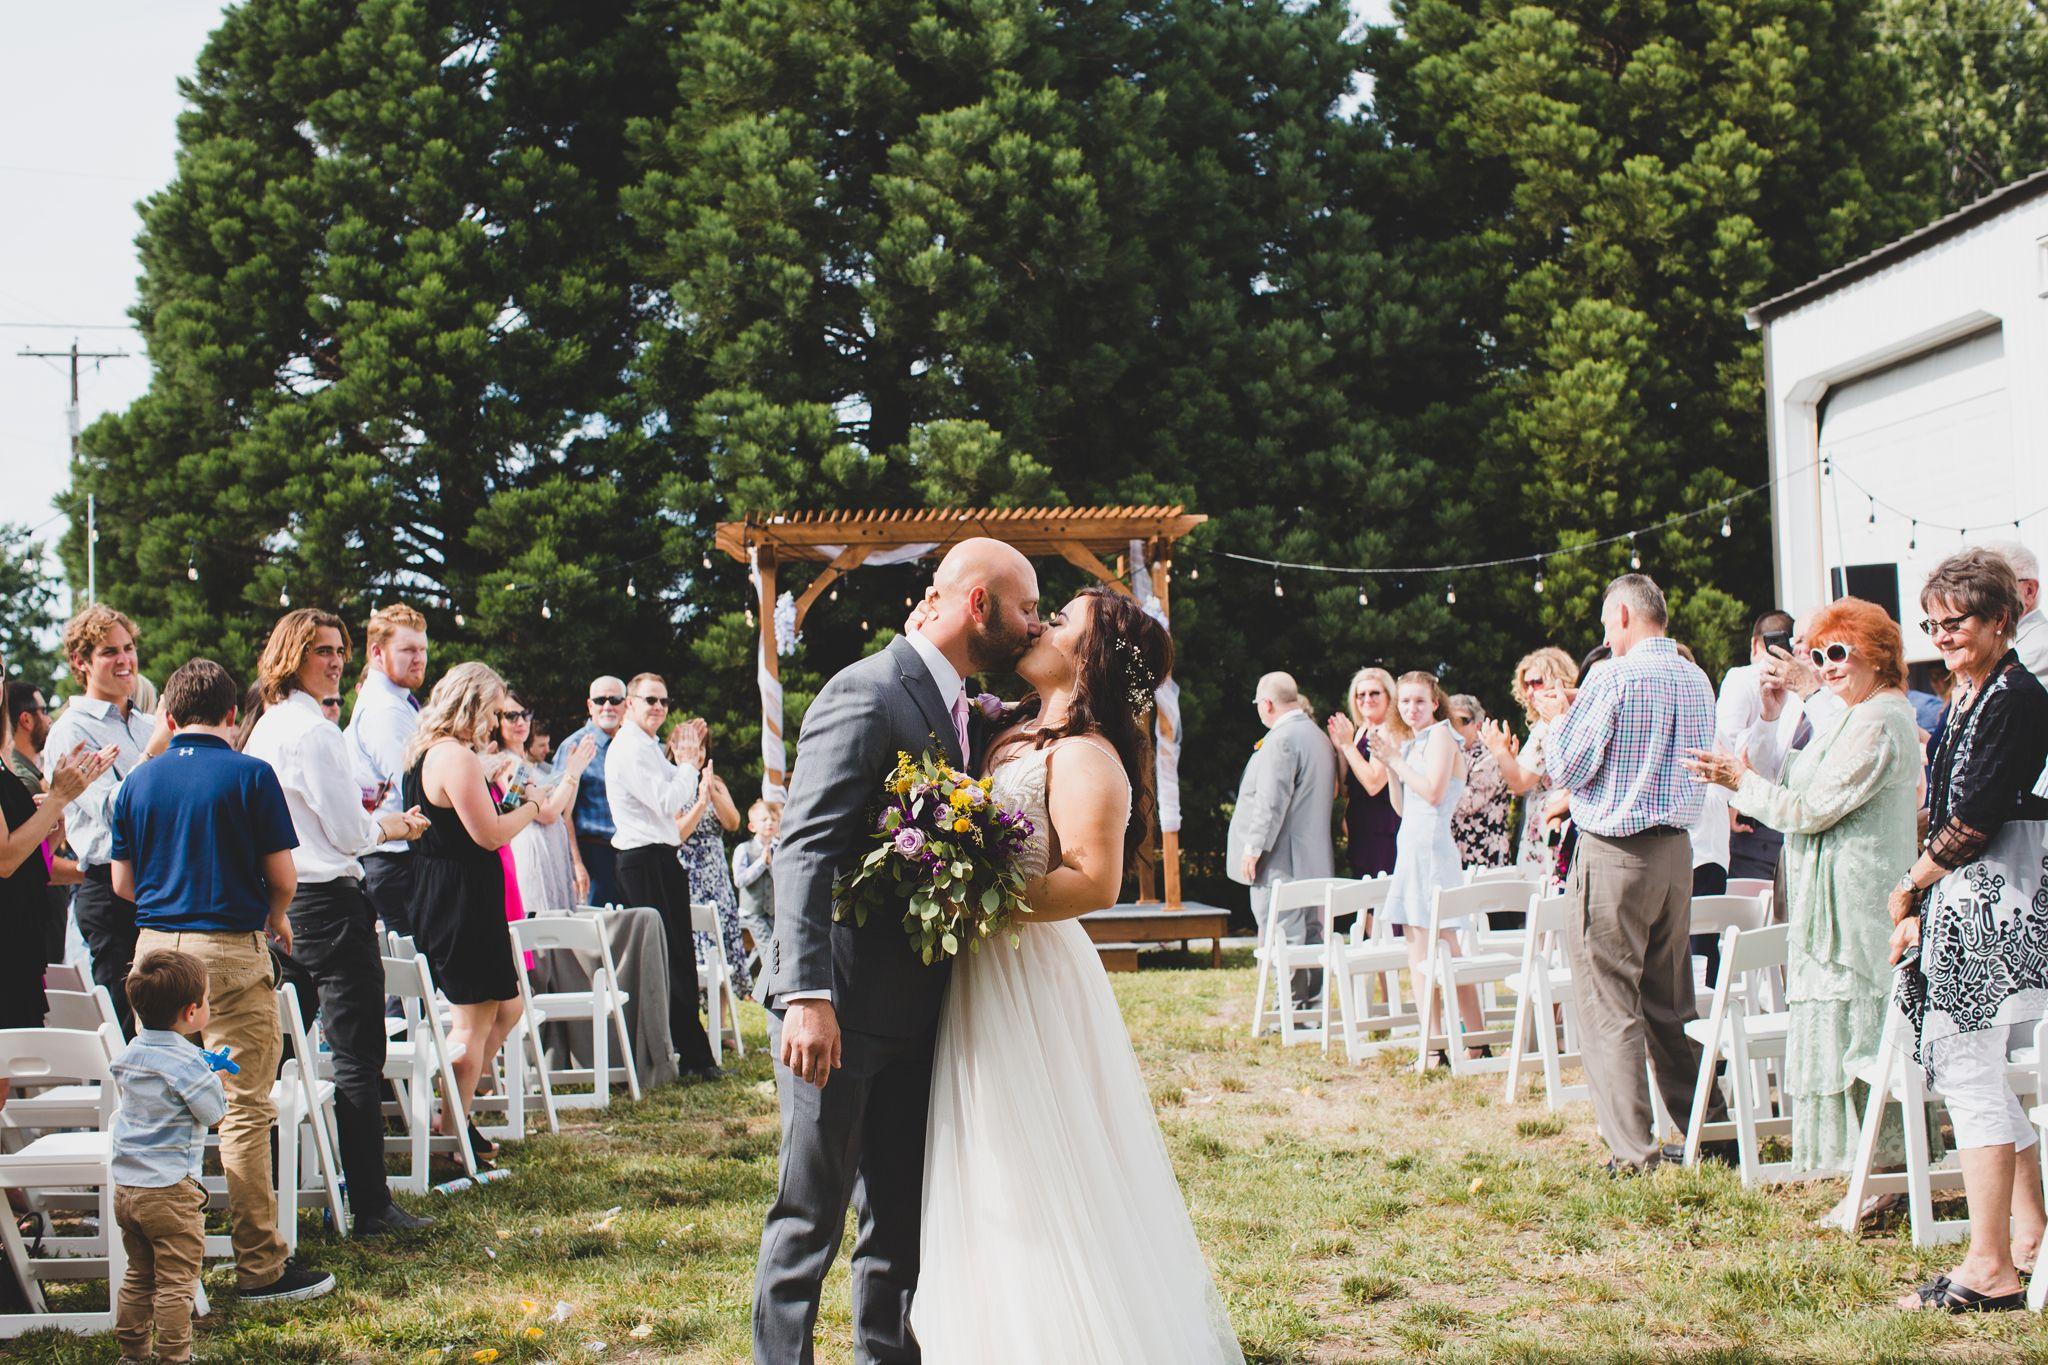 Backyard wedding / Private residence wedding / outdoor ...